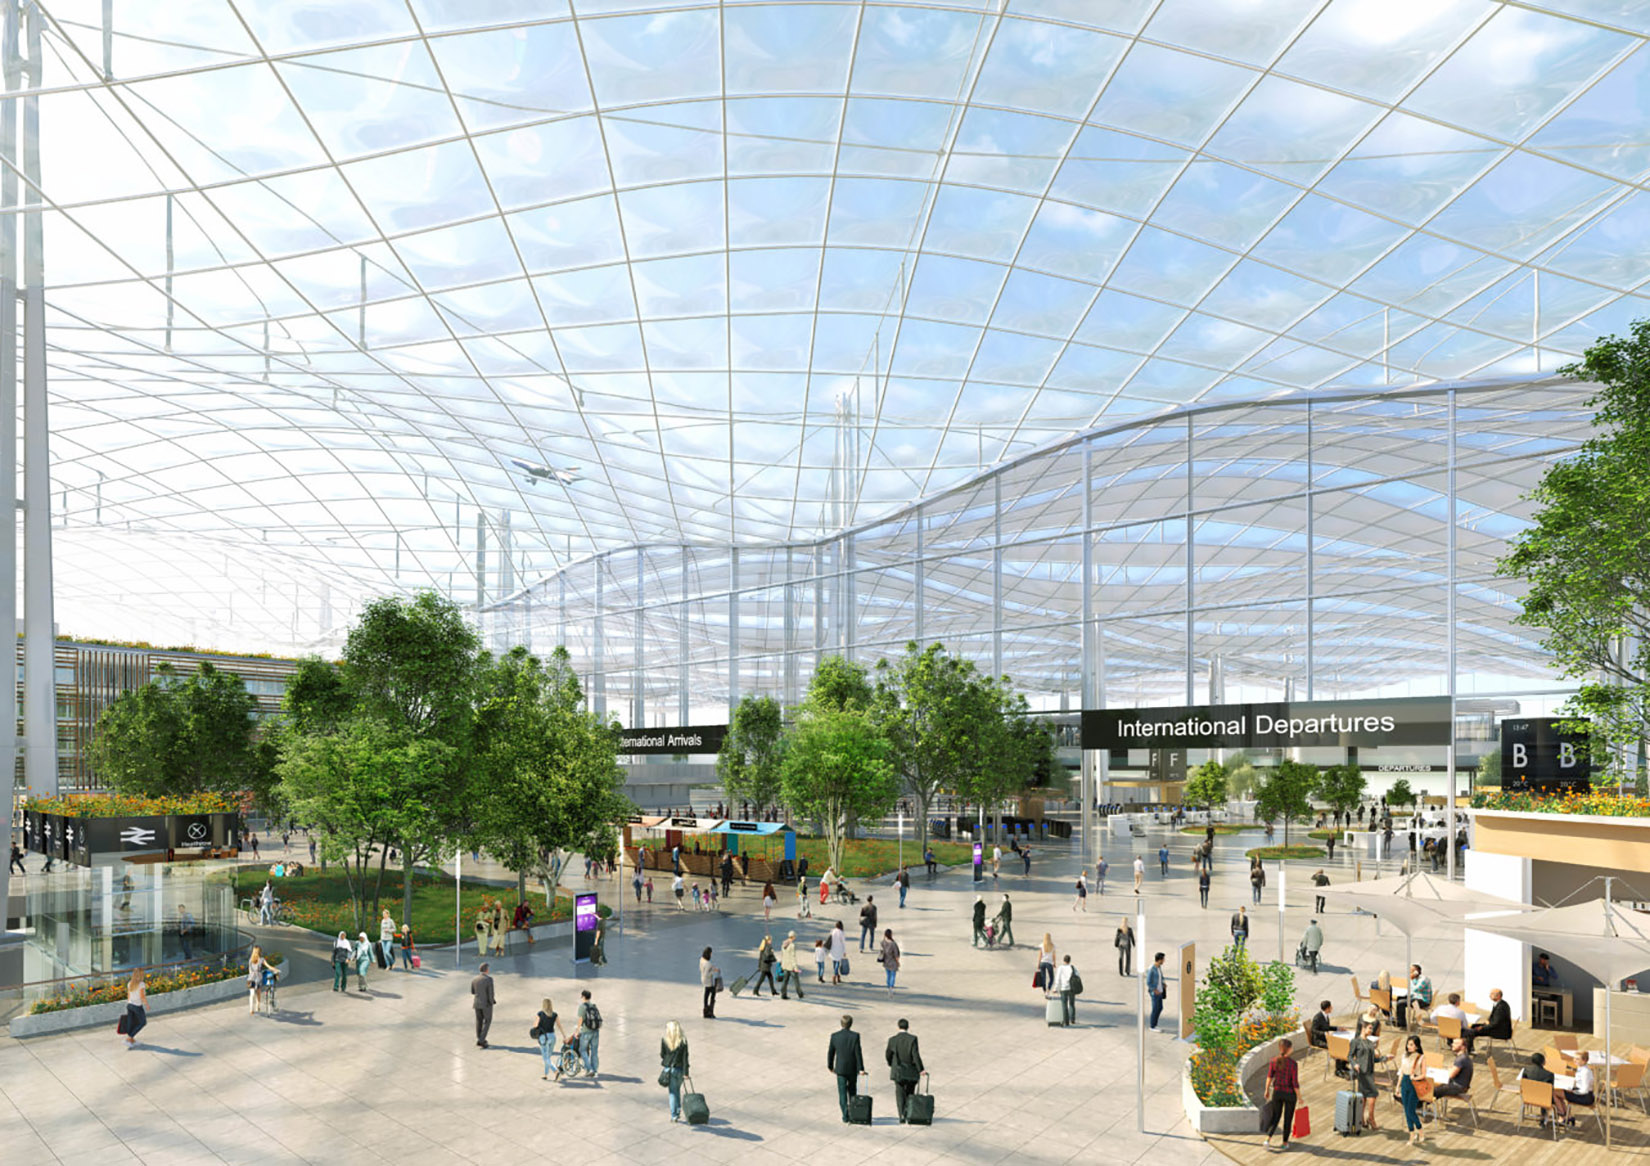 London Heathrow Airport's expansion 'masterplan' revealed | CNN Travel